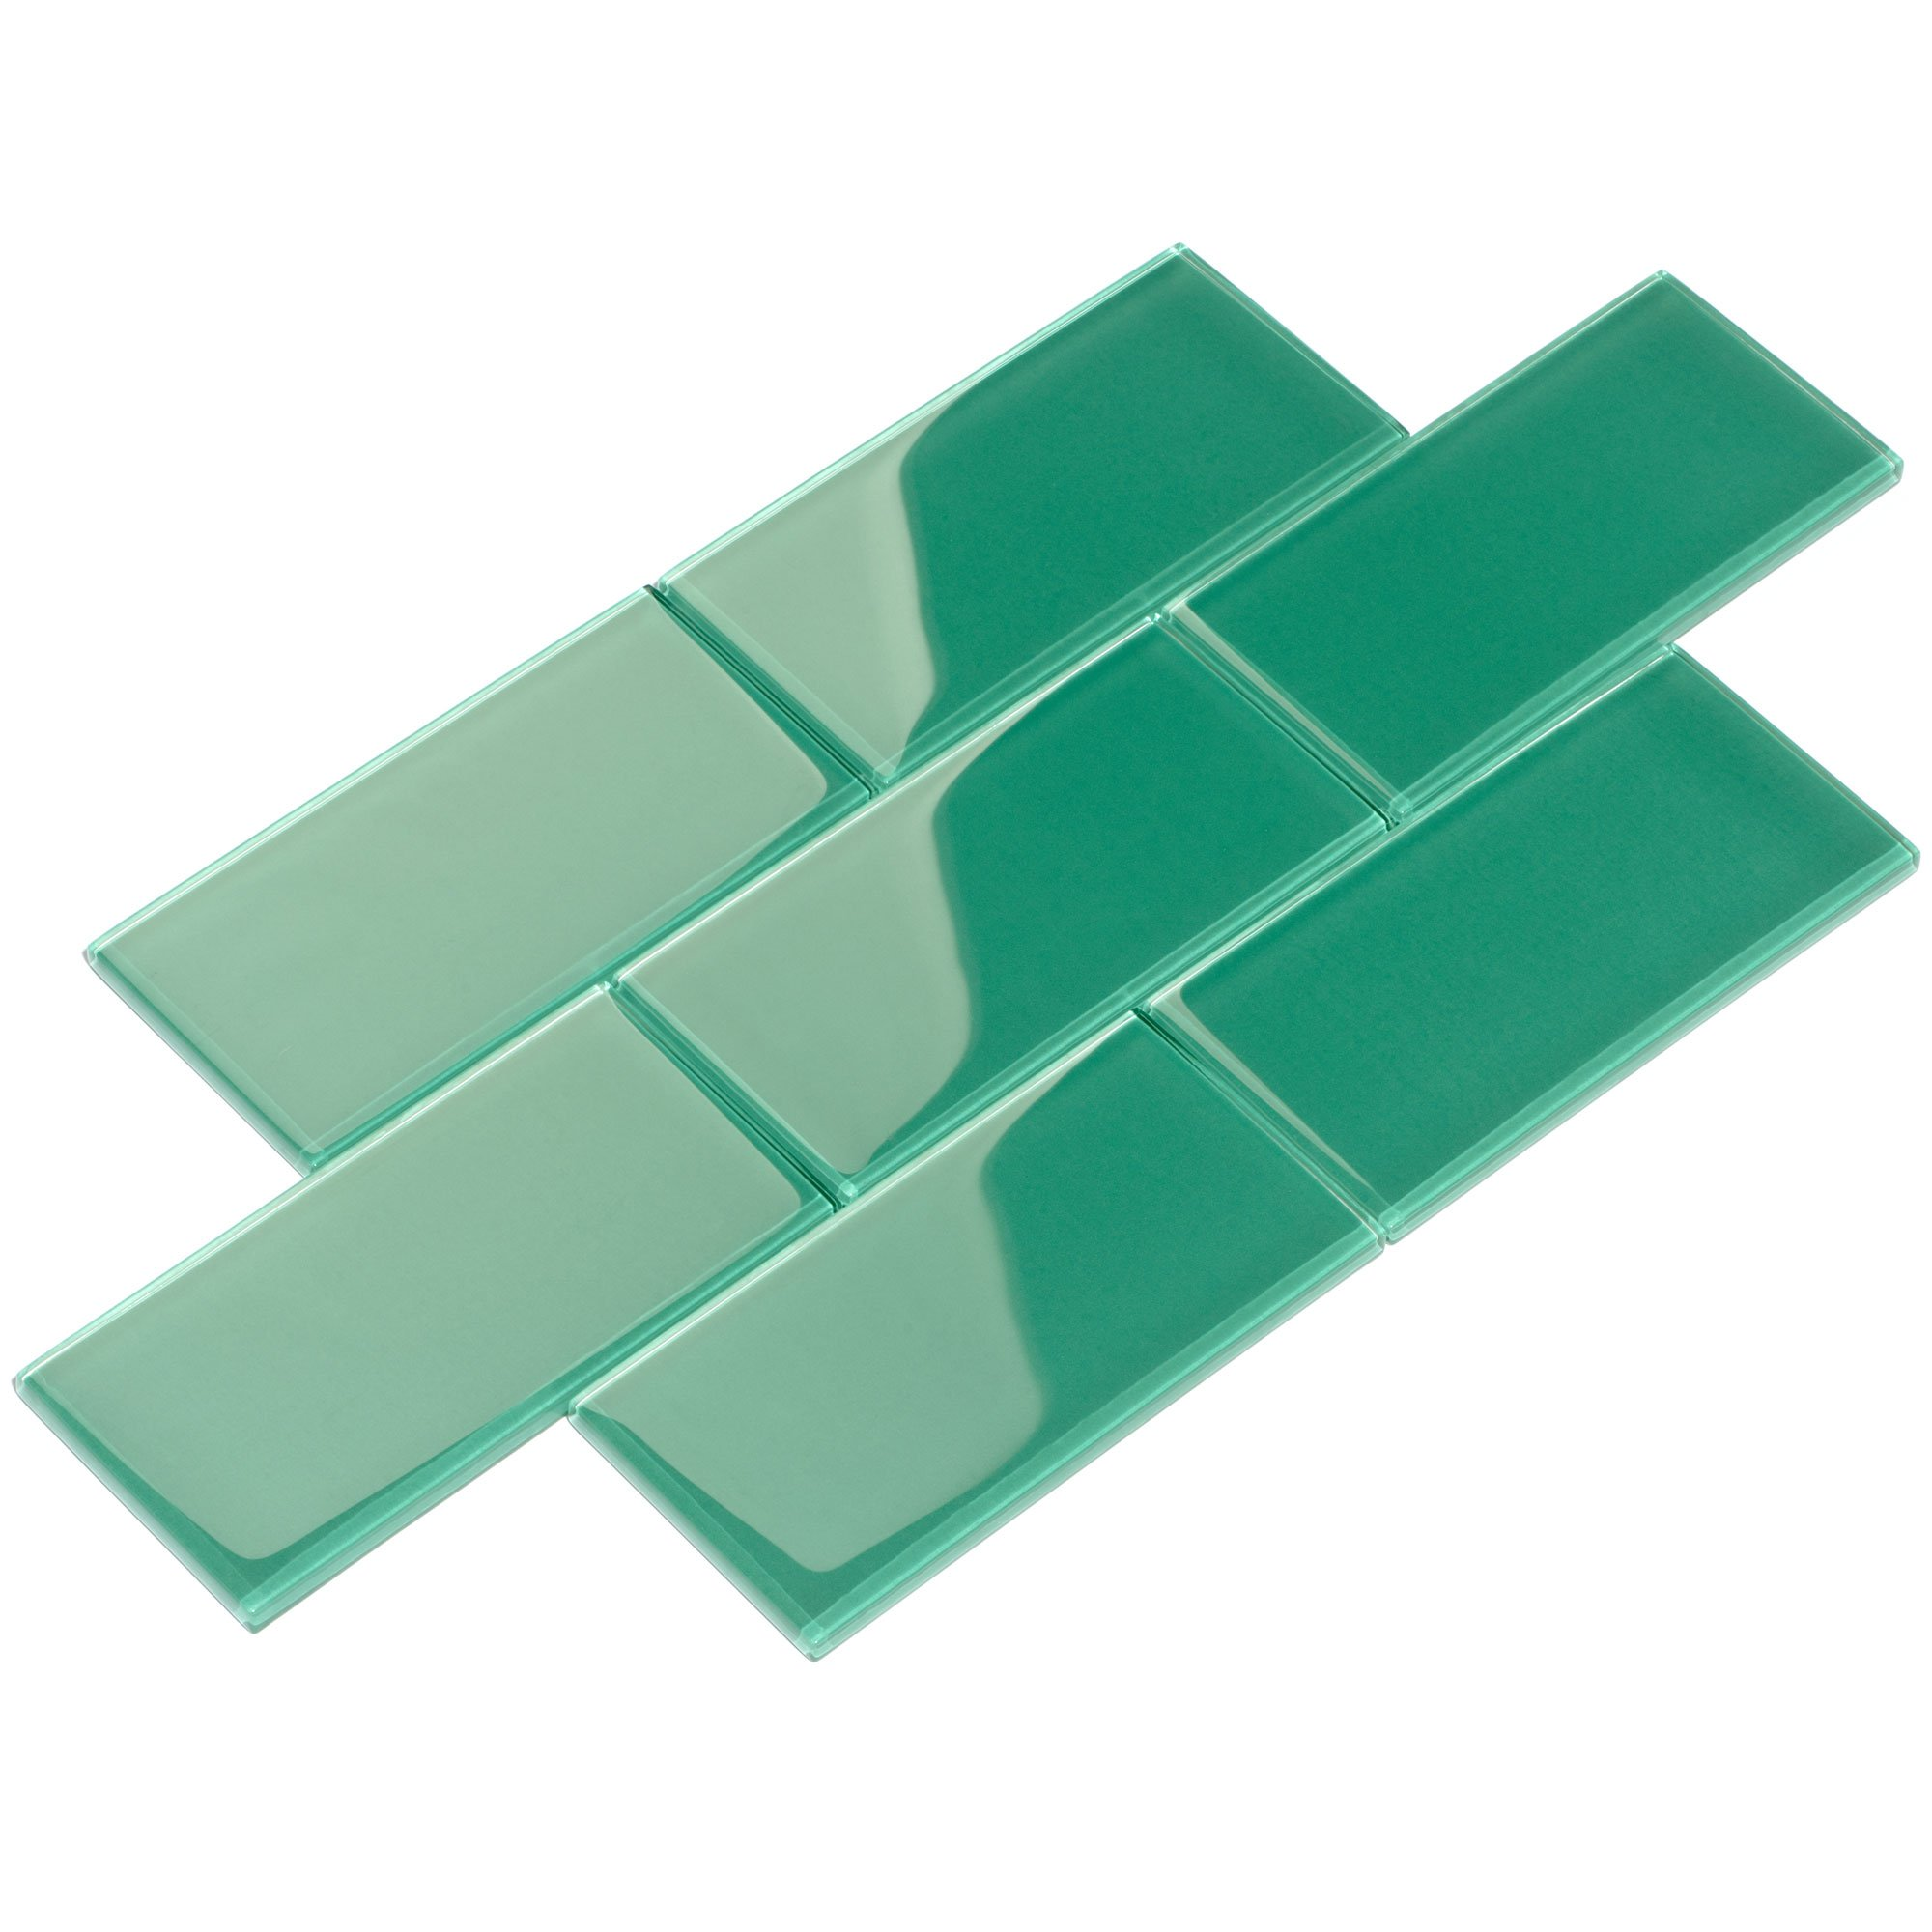 Giorbello G5936-44 Glass Subway Backsplash Tile, 3 x 6, Emerald Green